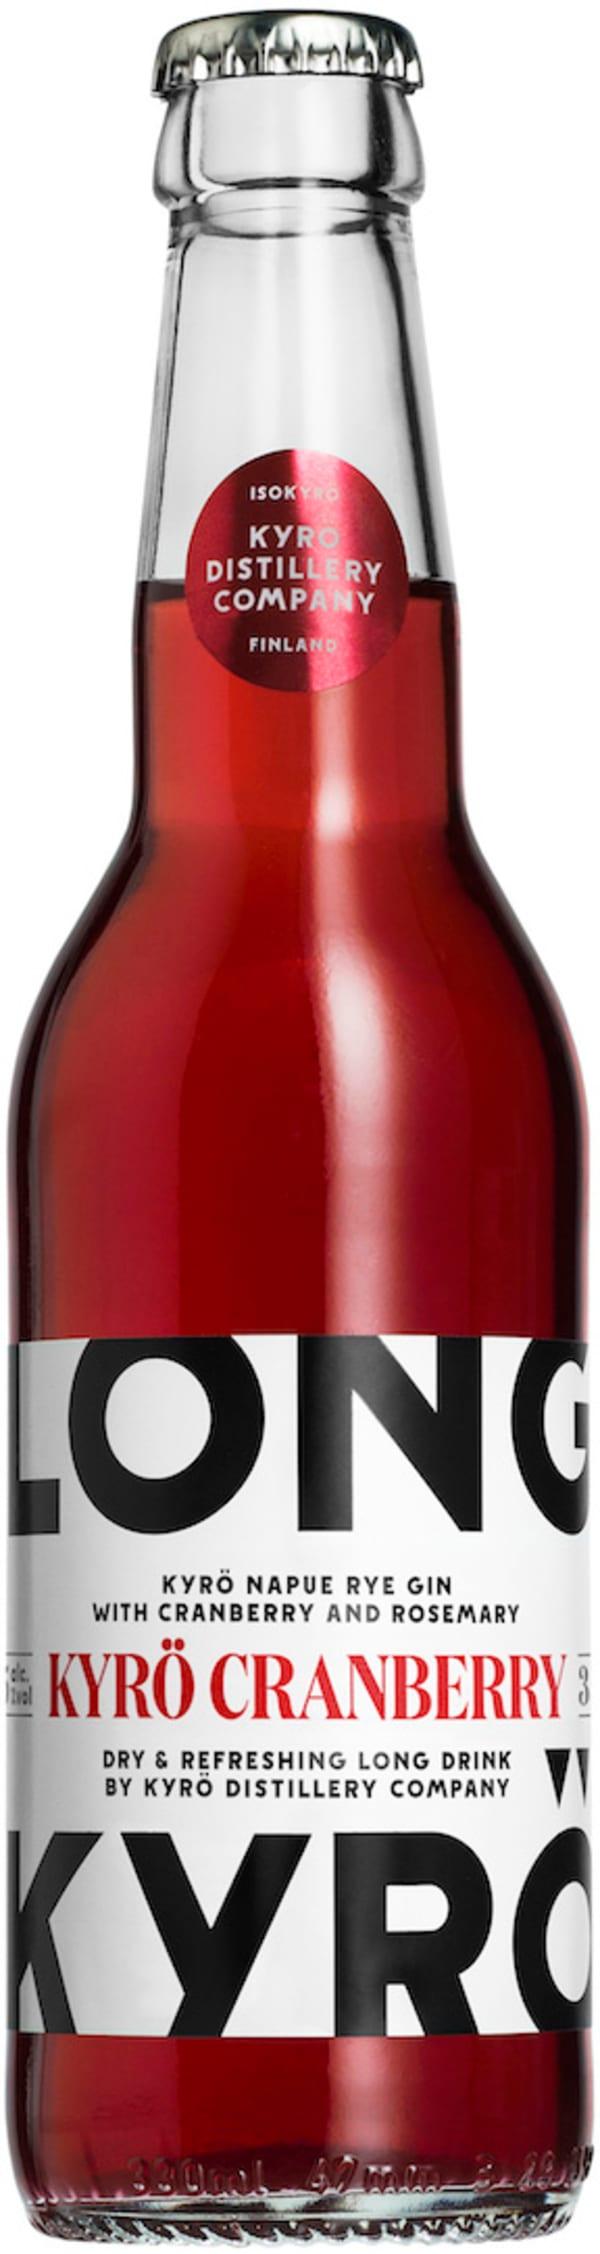 Kyrö Cranberry Long Drink